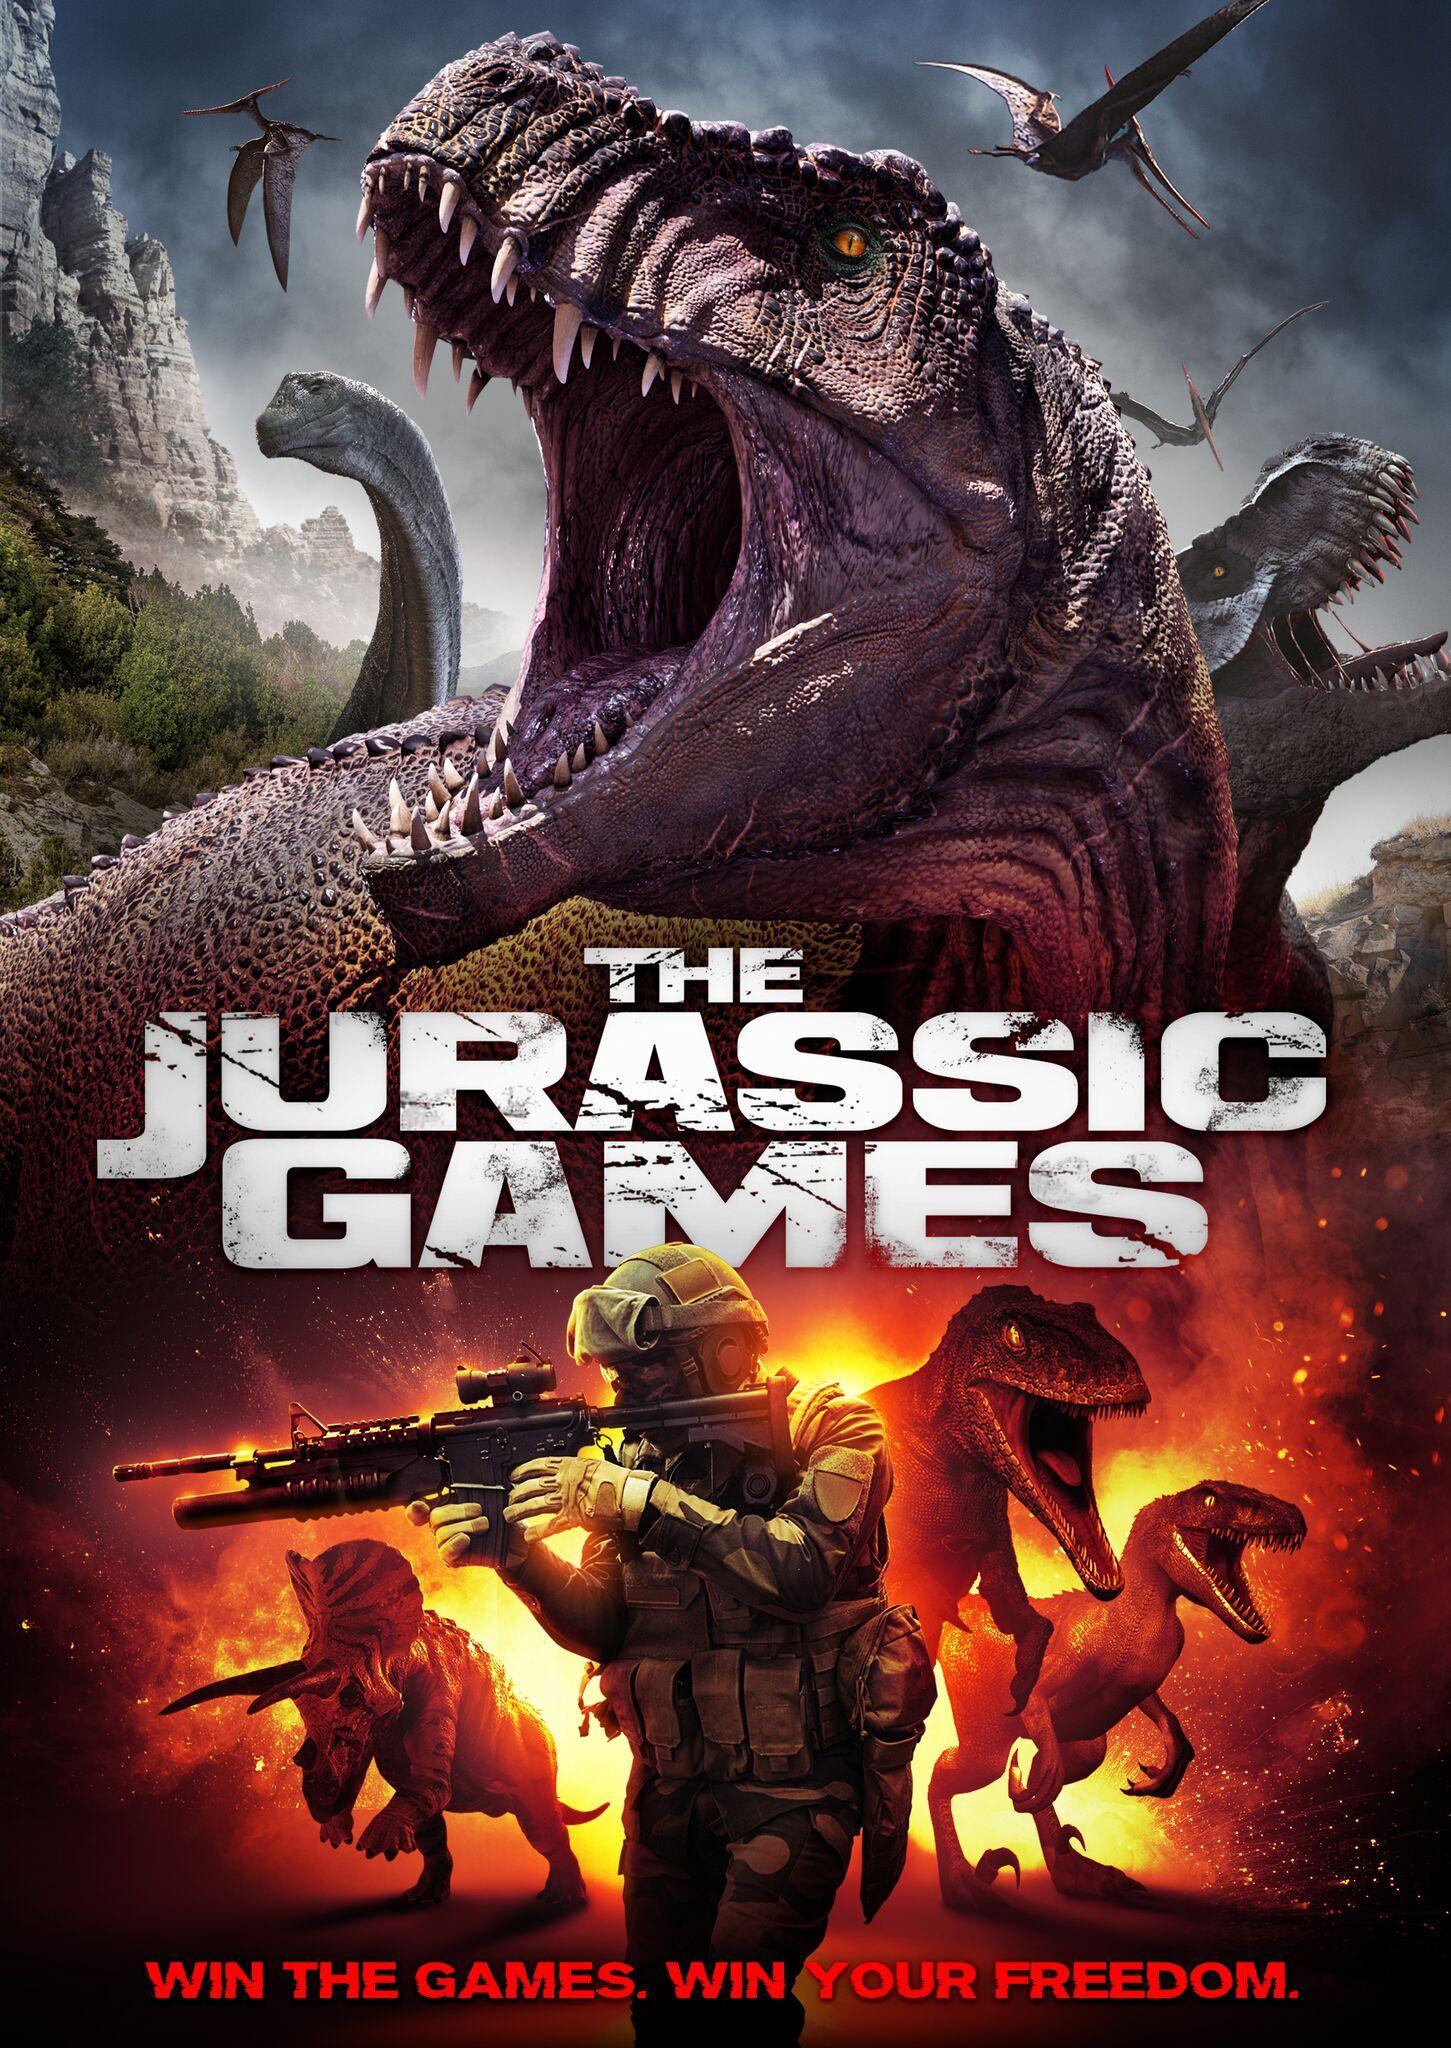 Jurassic Games DVD, Actress Katie Burgess, Jurassic Games